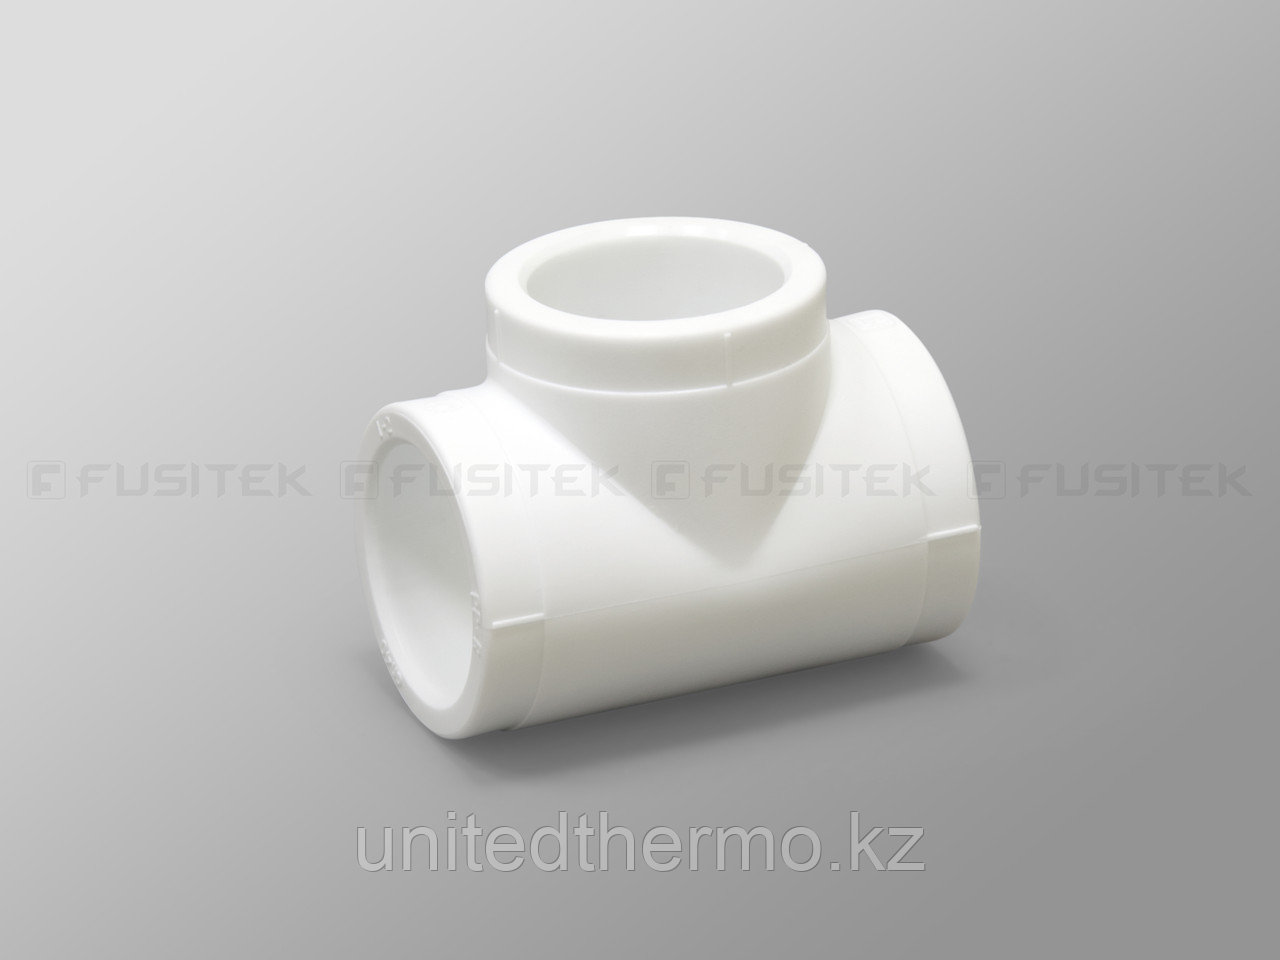 Тройник равносторонний 25 мм Fusitek